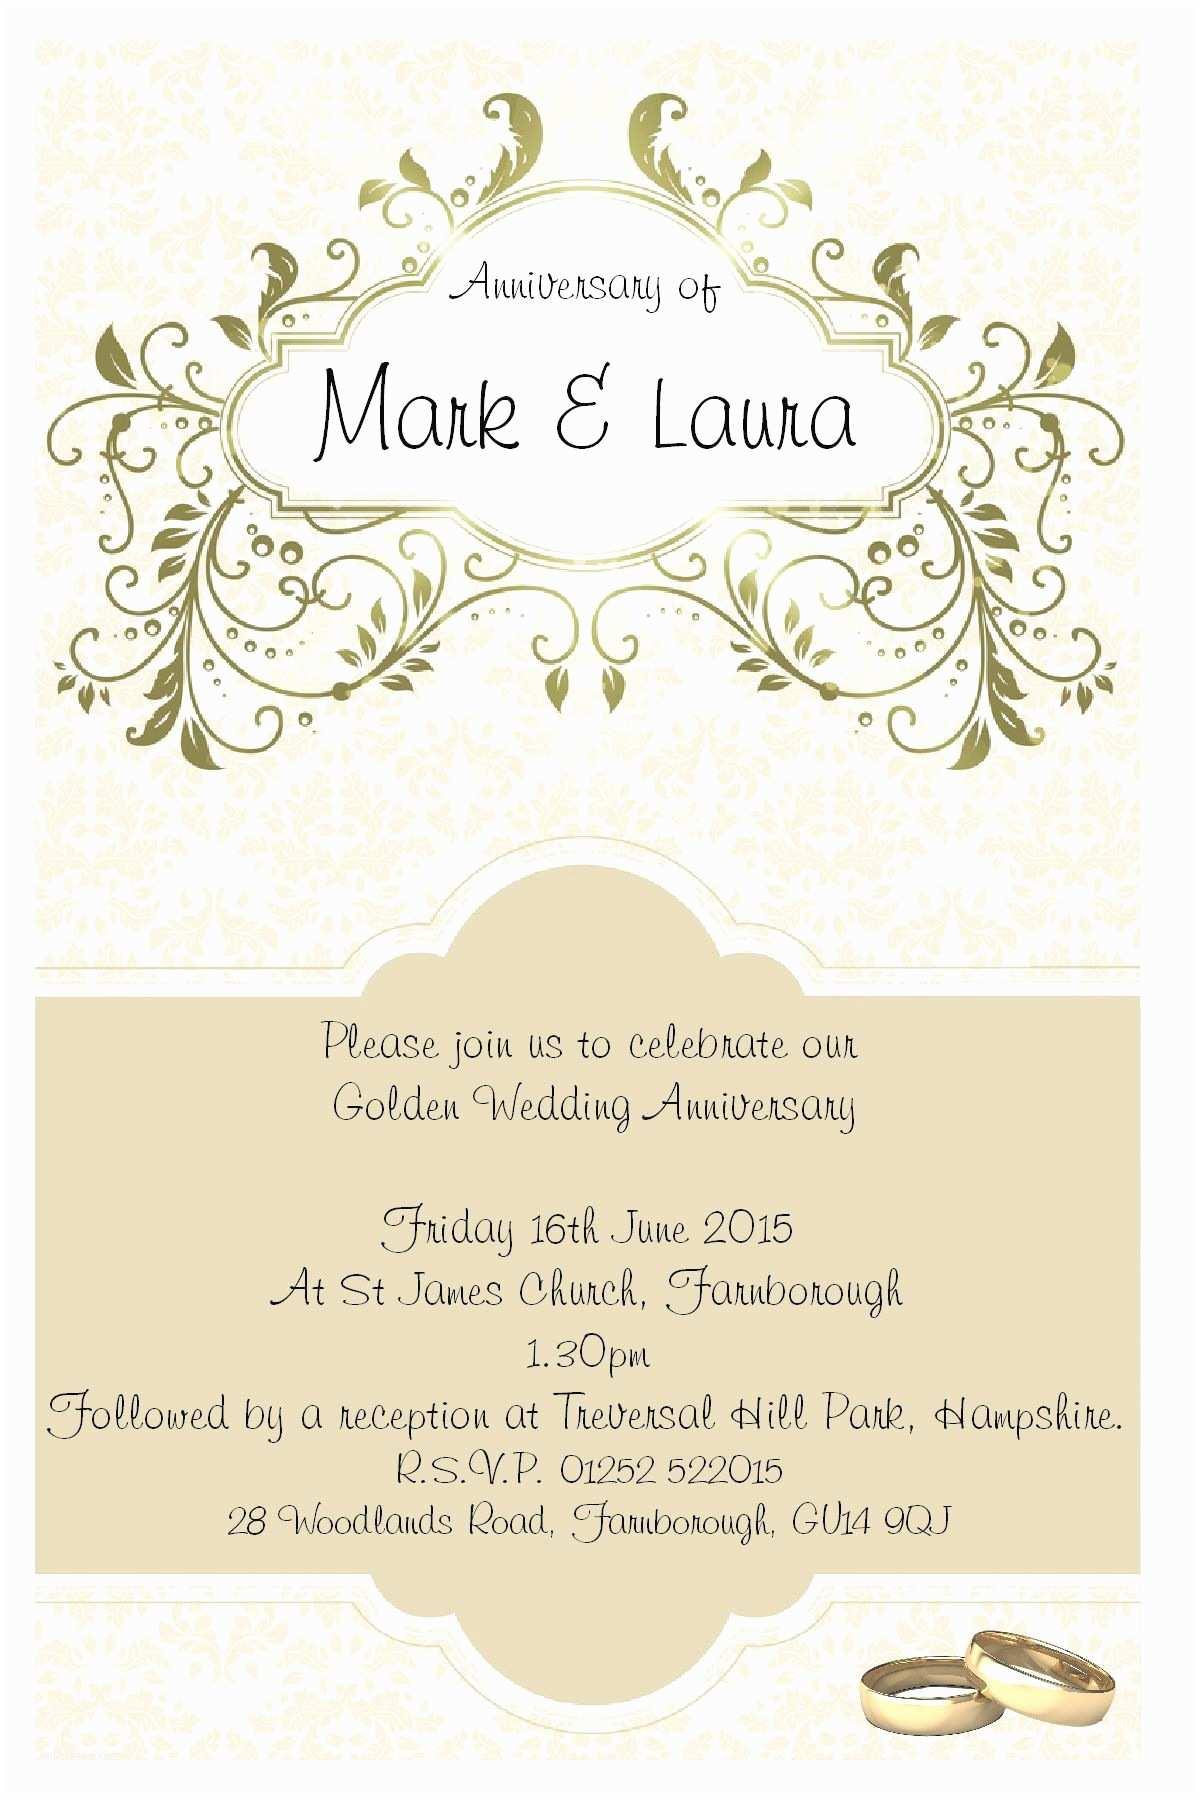 25th Wedding Anniversary Invitation Cards Free Download Wording for Golden Wedding Invitations Uk – Mini Bridal